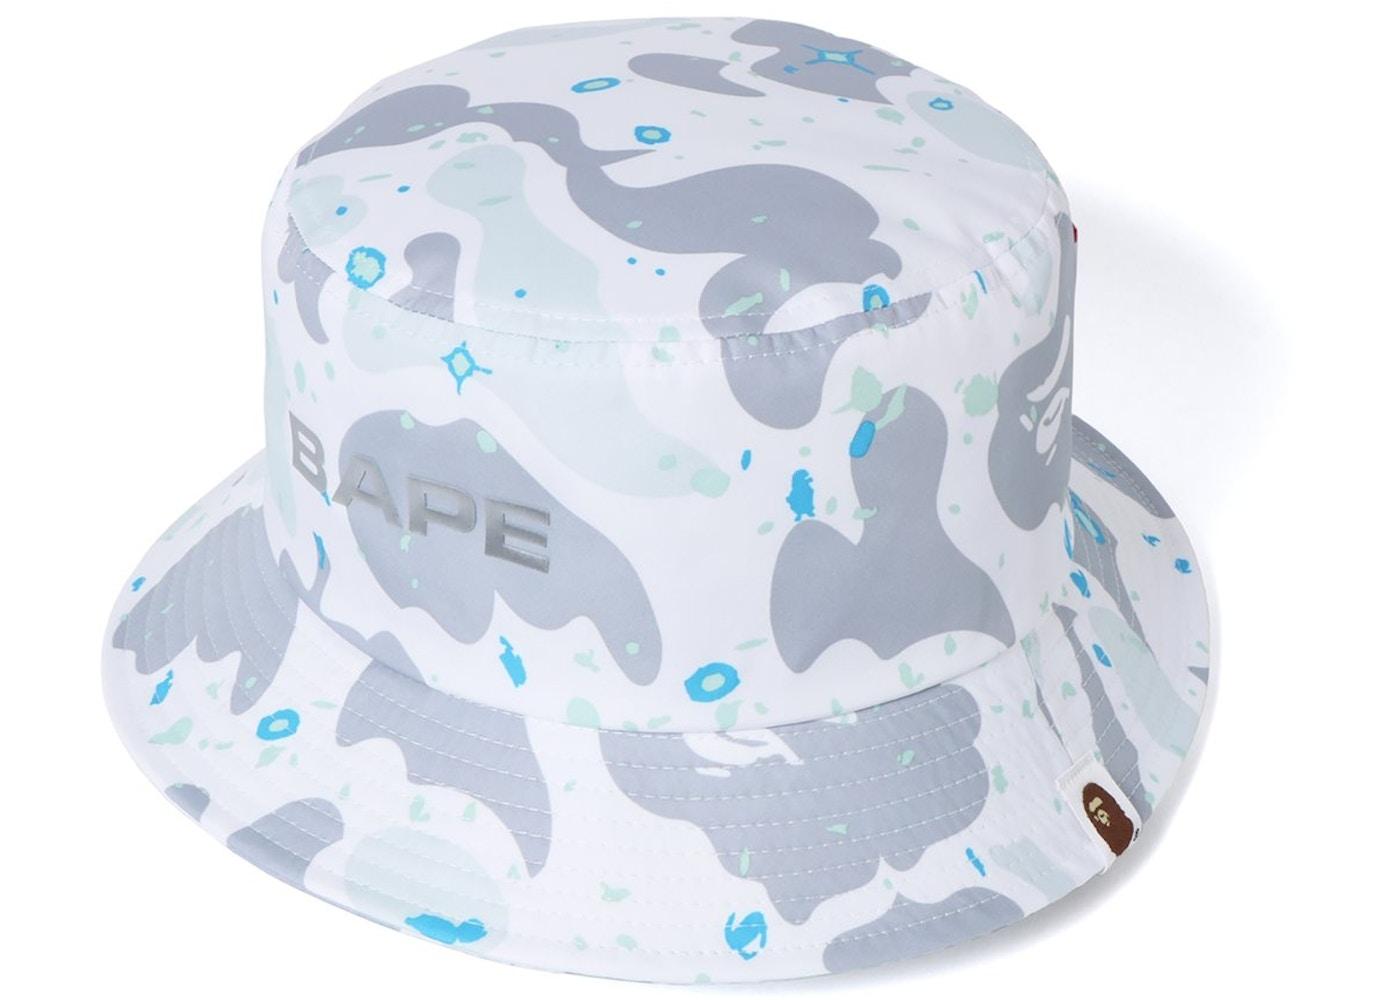 e18afe8ebc893 BAPE Space Camo Bucket Hat White - SS19